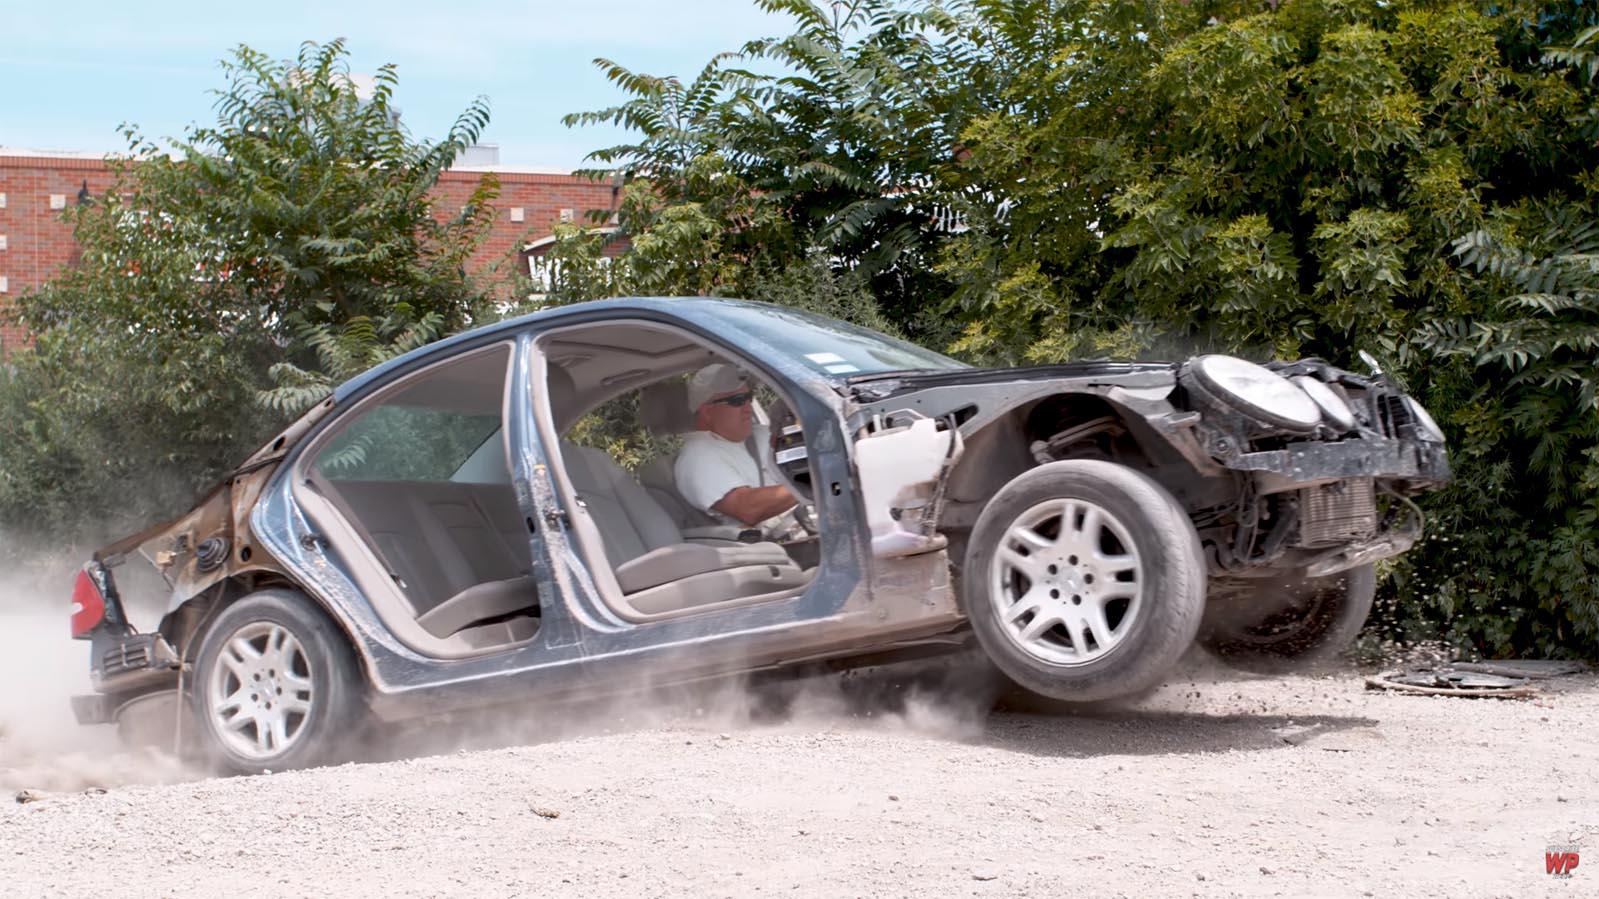 Photo of Τι γίνεται σε ένα αυτοκίνητο όταν περνάτε από μία λακκούβα;